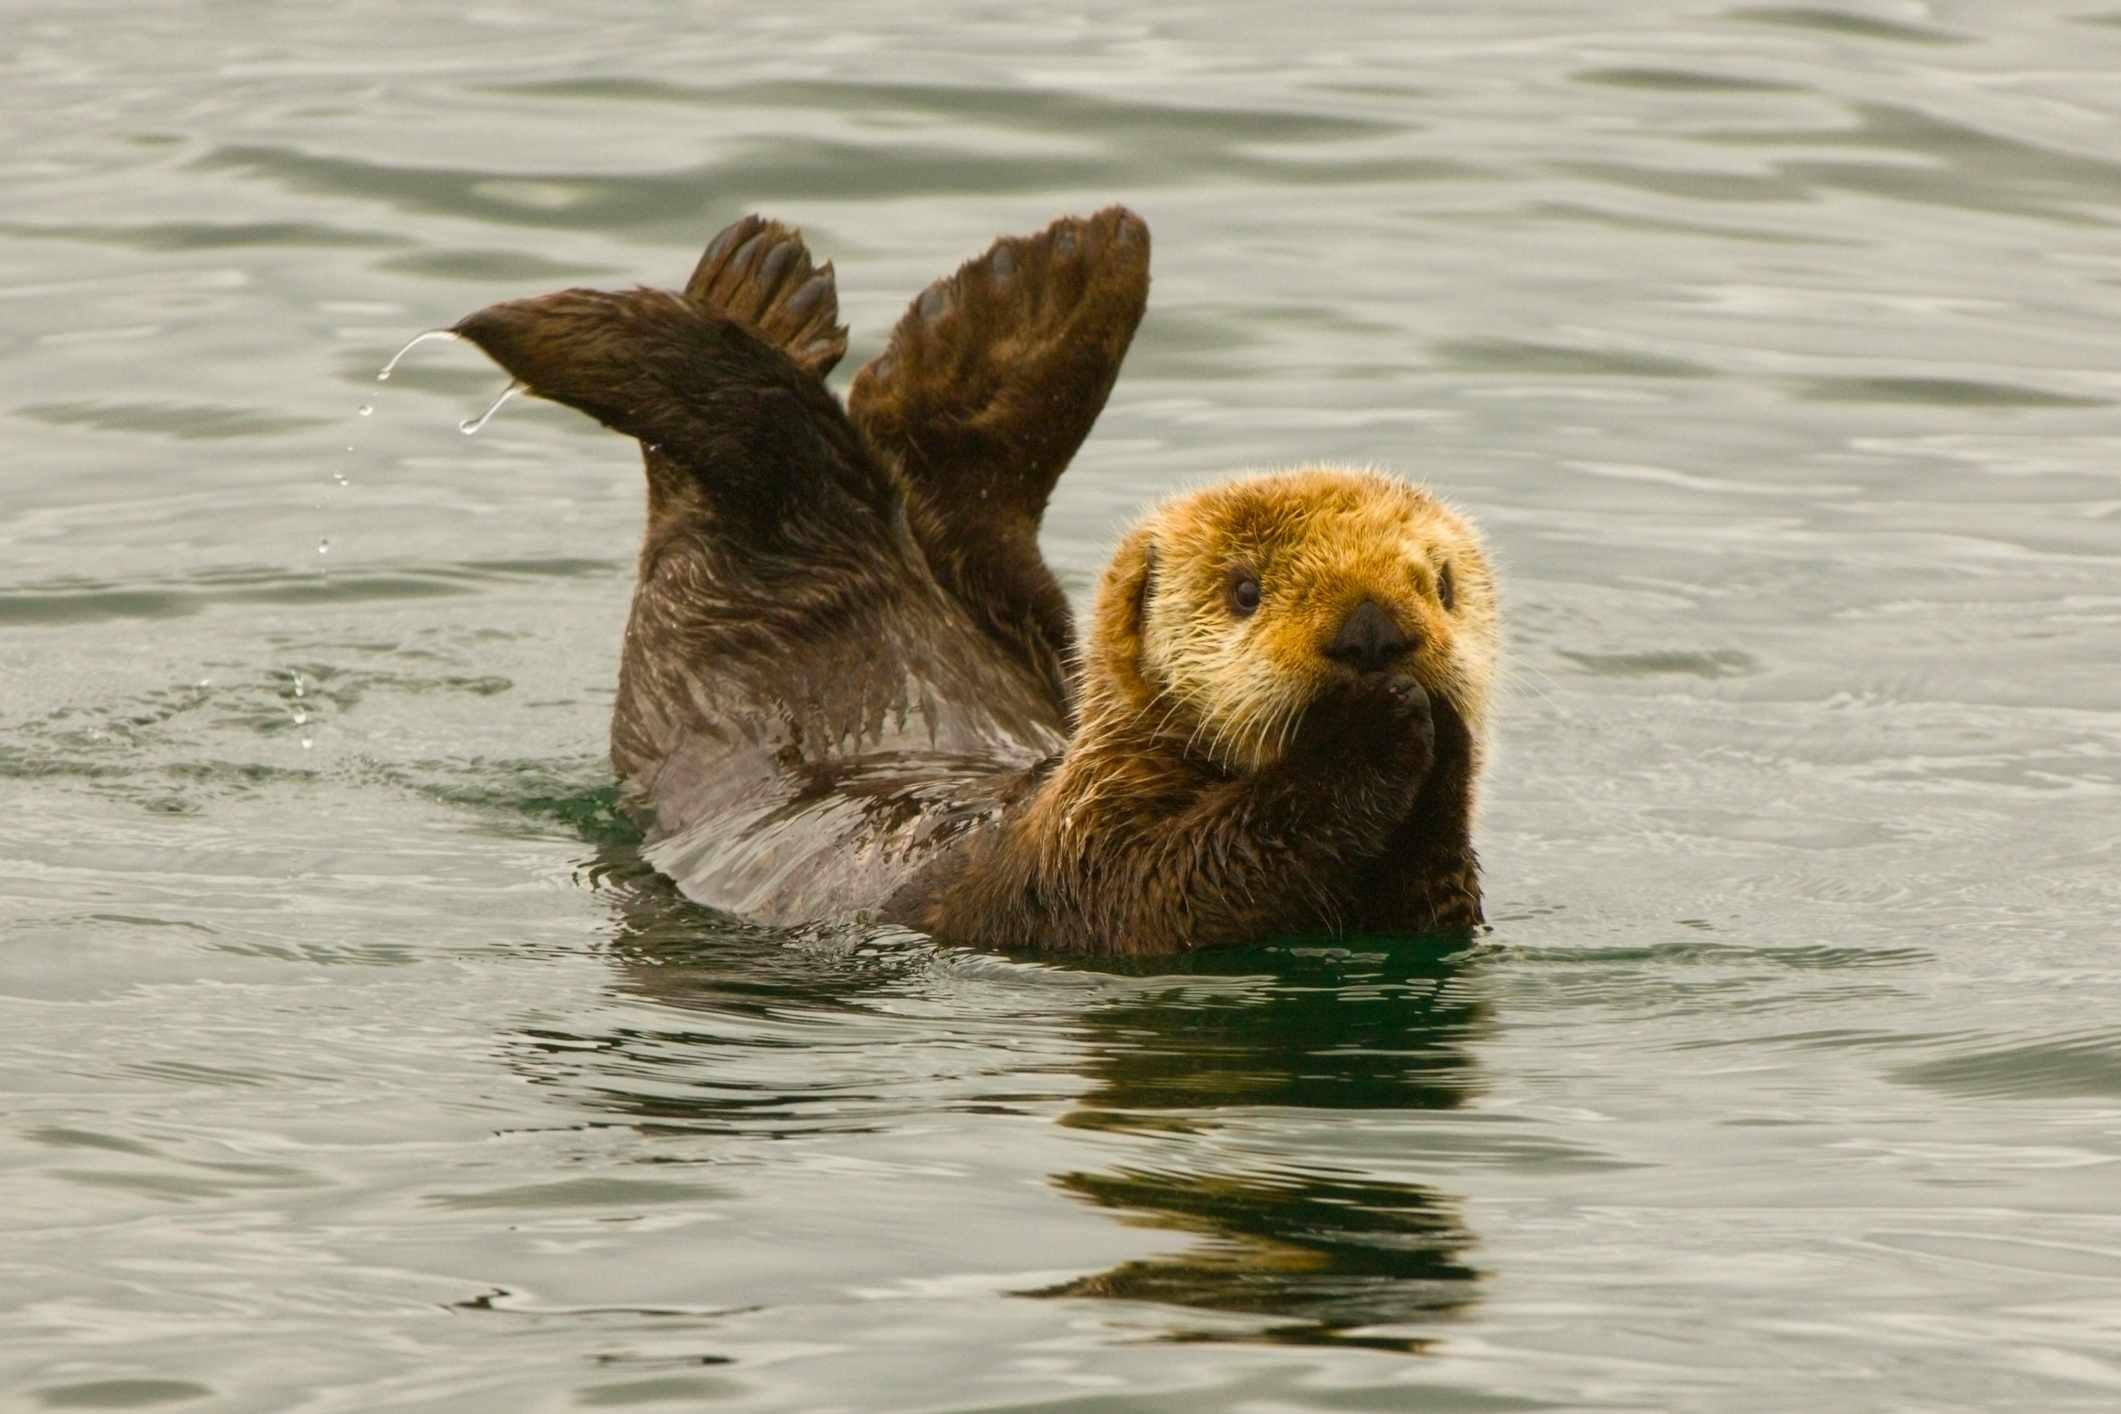 Cute sea otter in Alaska. © Blaine Harrington III/Getty